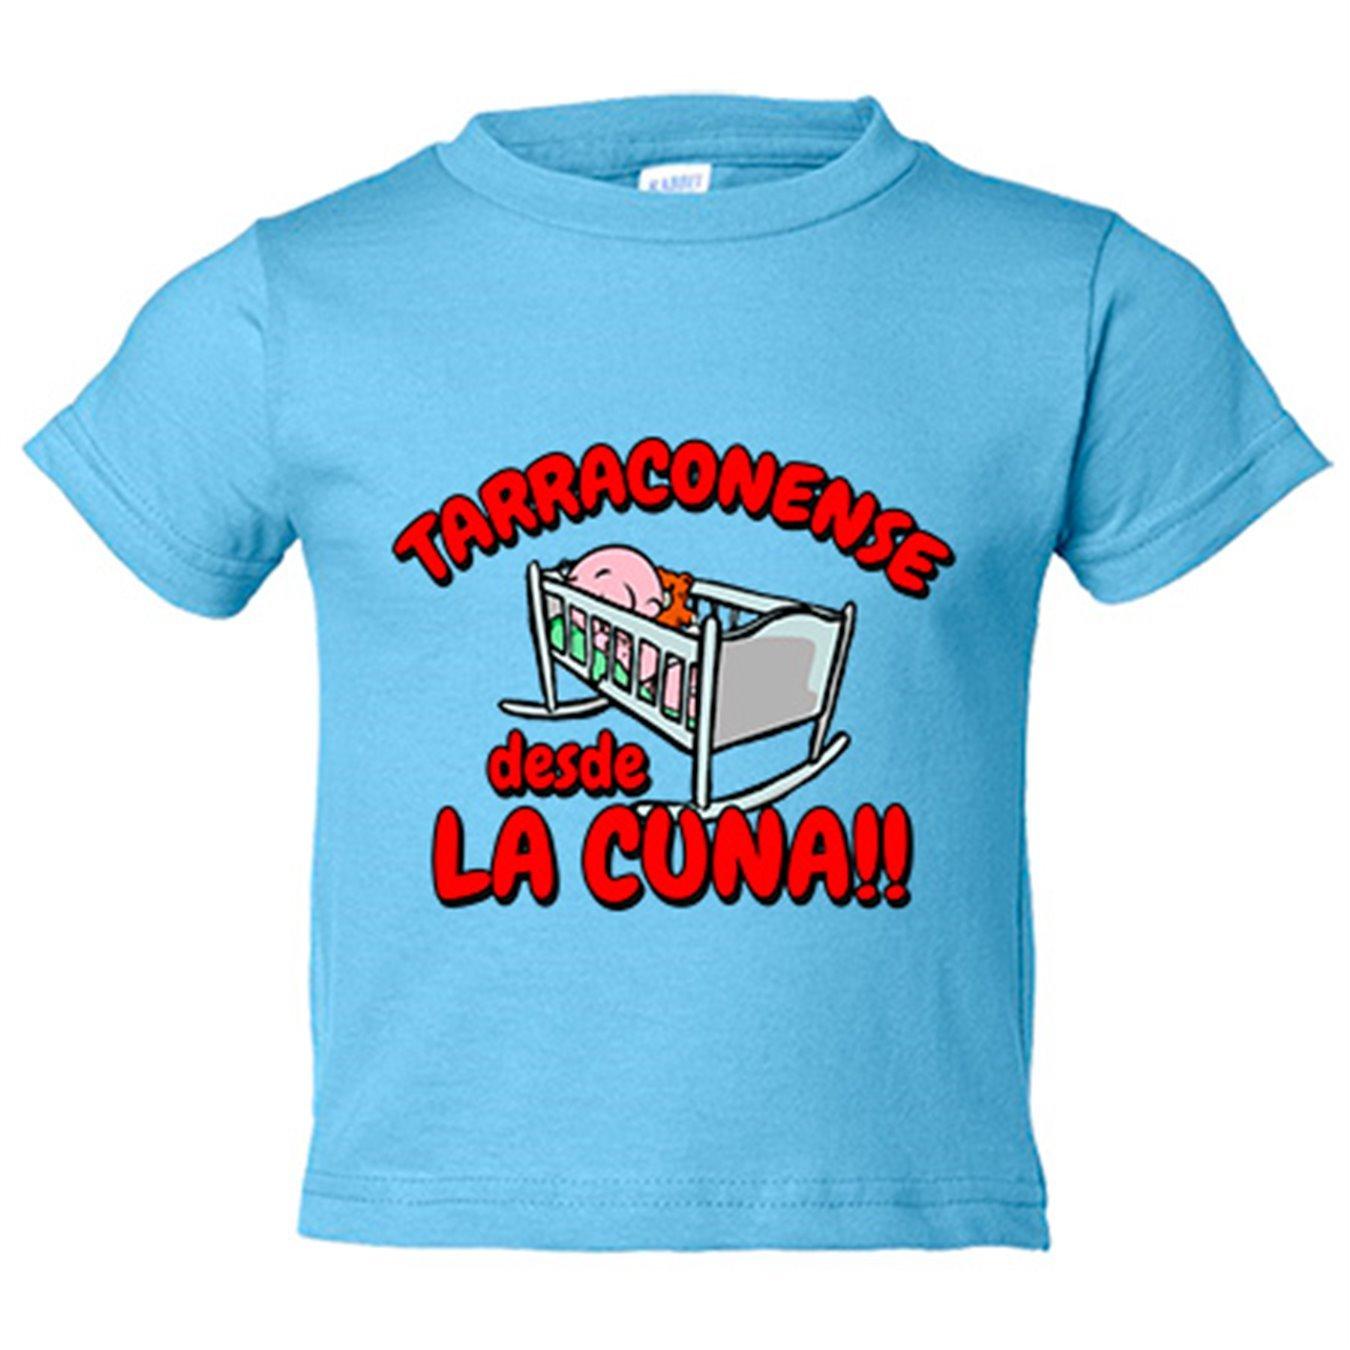 Camiseta niño Tarragonense desde la cuna Tarragoní Tarragona ...